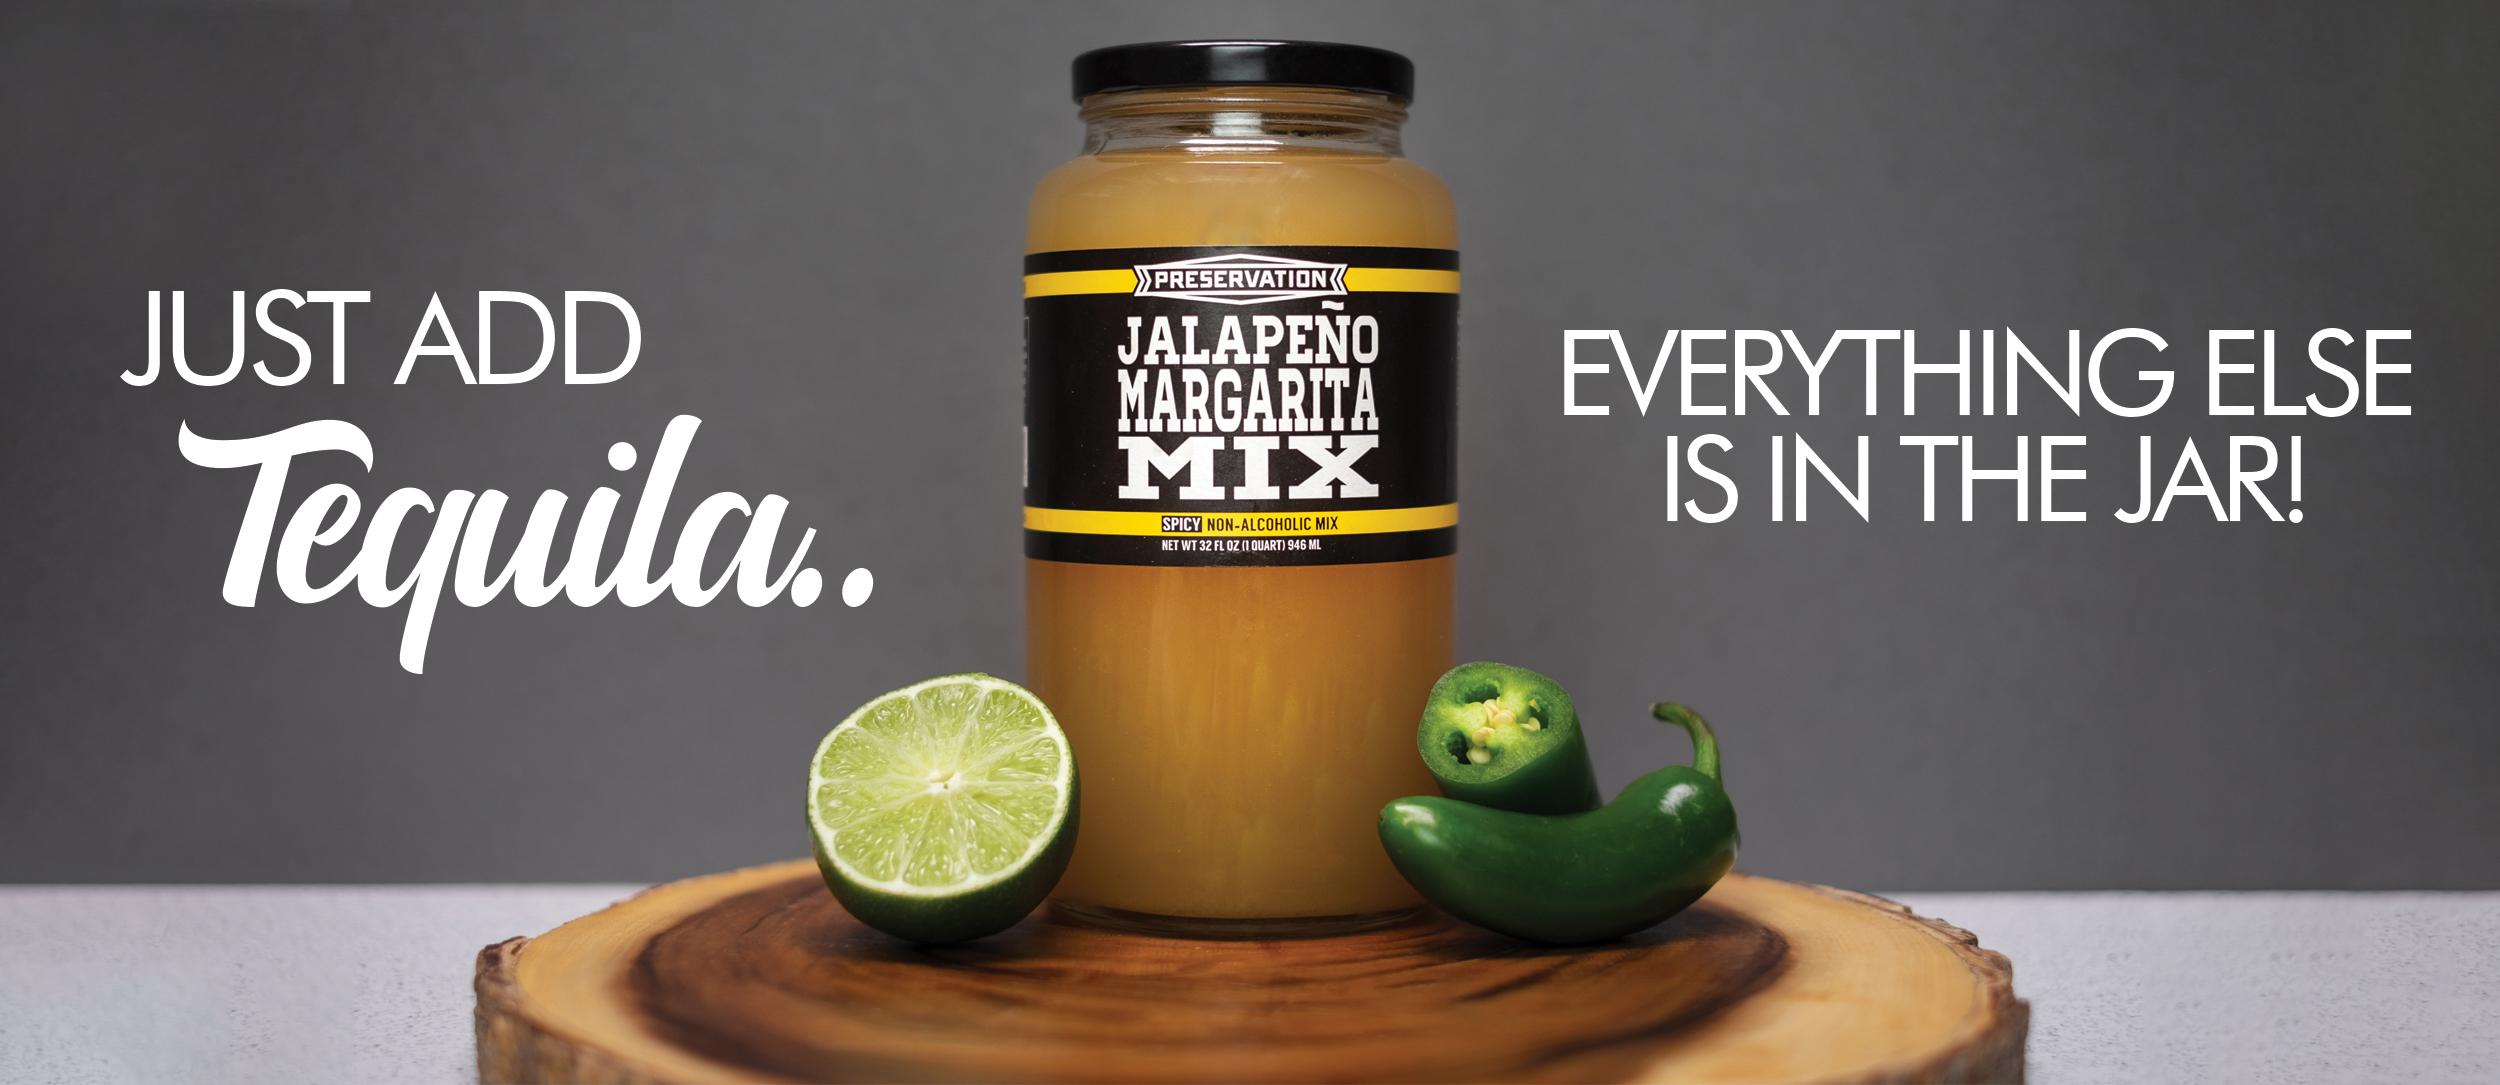 Just-add-tequila-banner.jpg